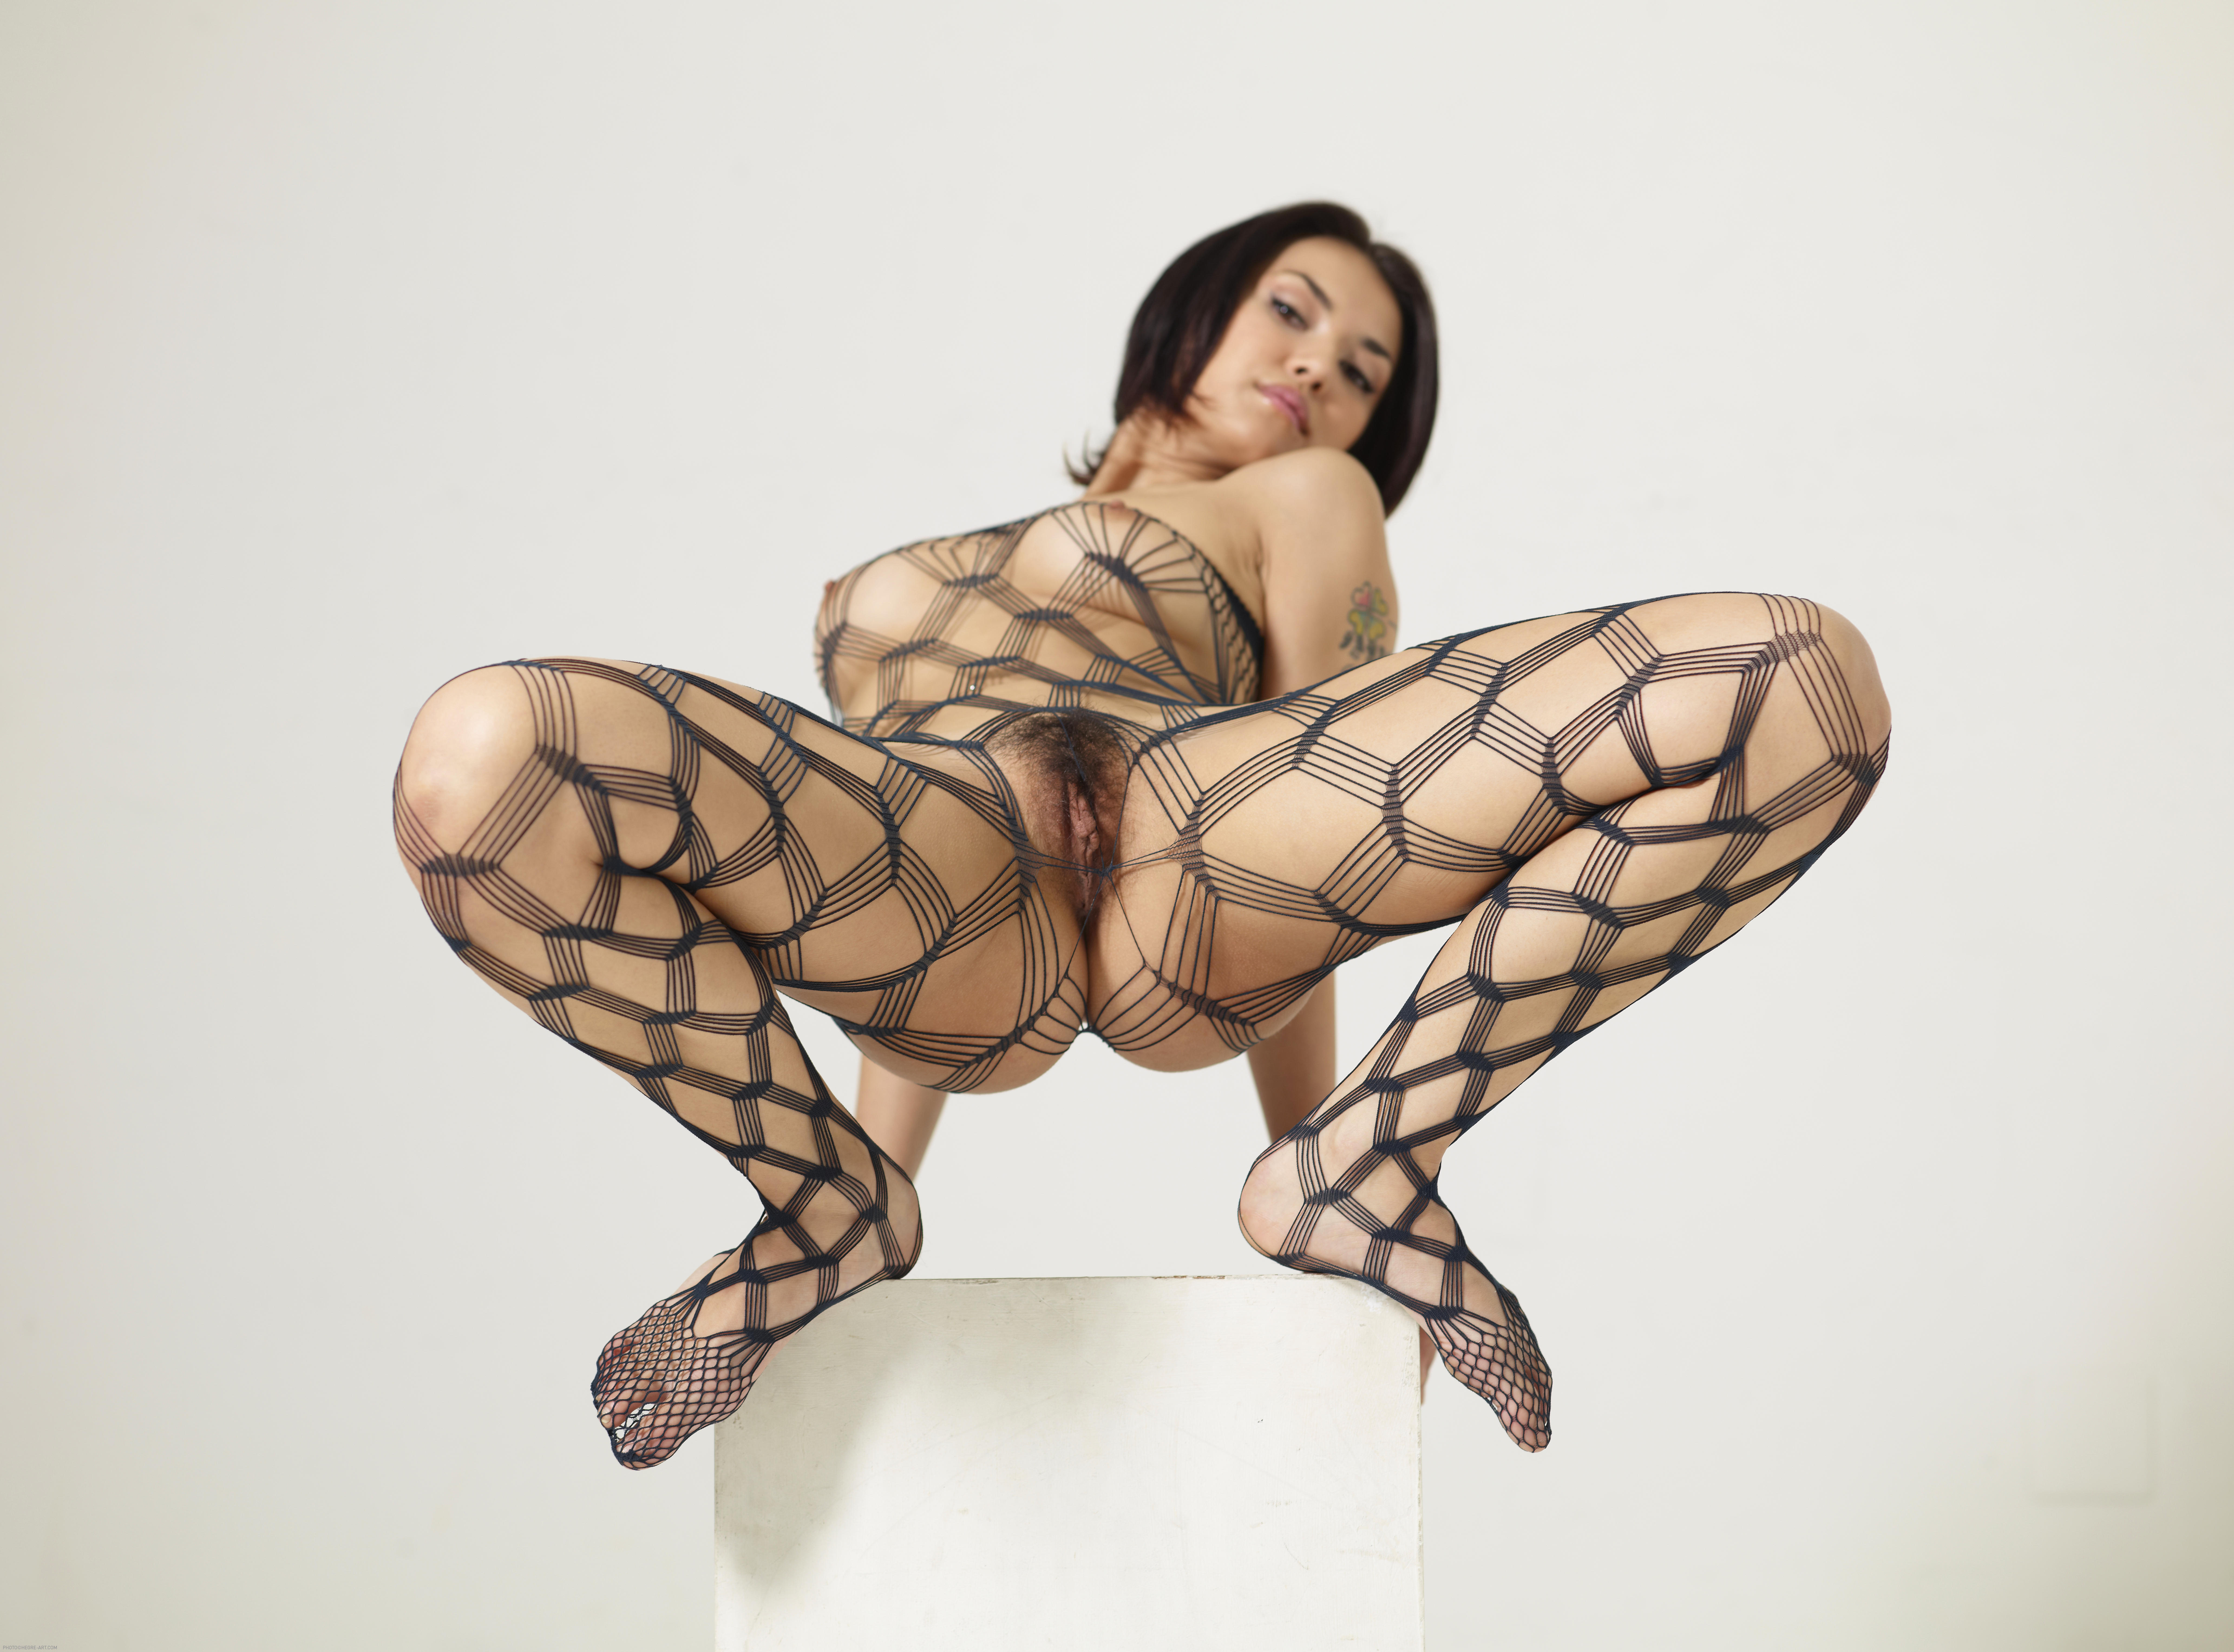 naked girl does acrobatics